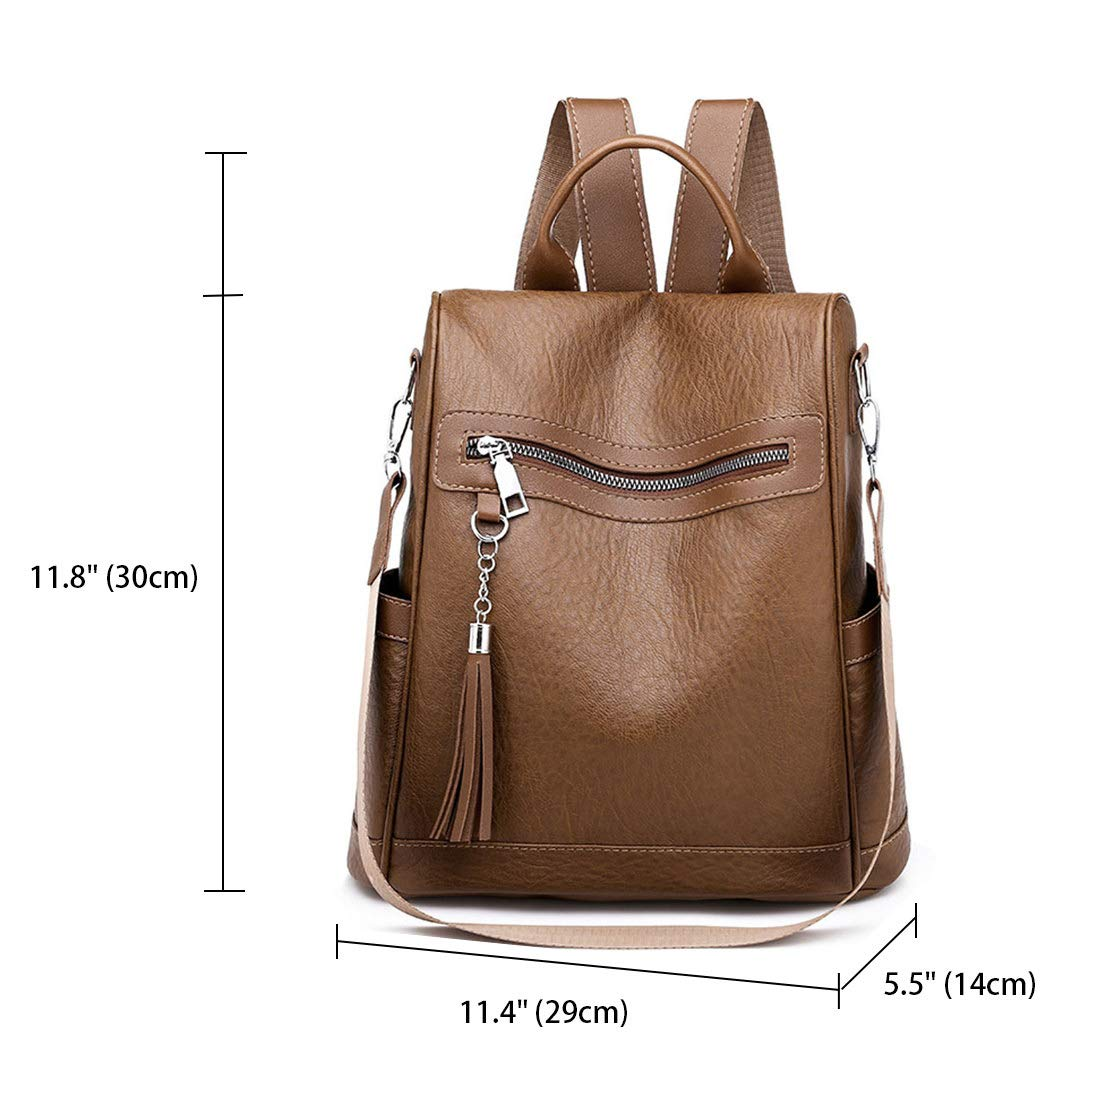 DEERWORD Womens Backpack Handbags Rucksack Shoulder Bags PU Leather Mini Kawaii